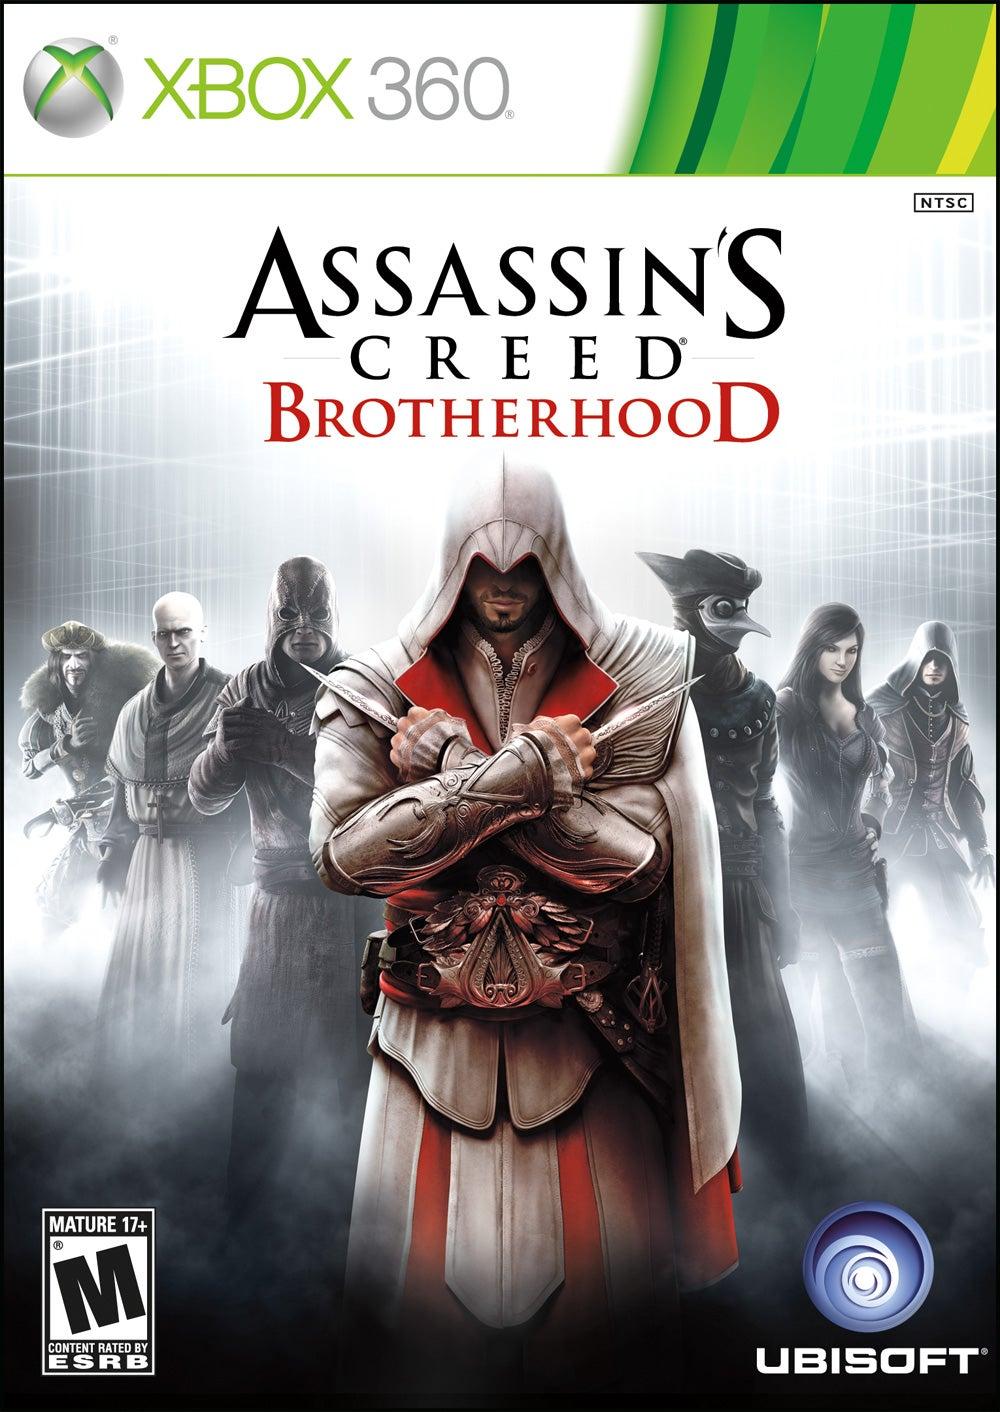 Creed brotherhood porno s assassin